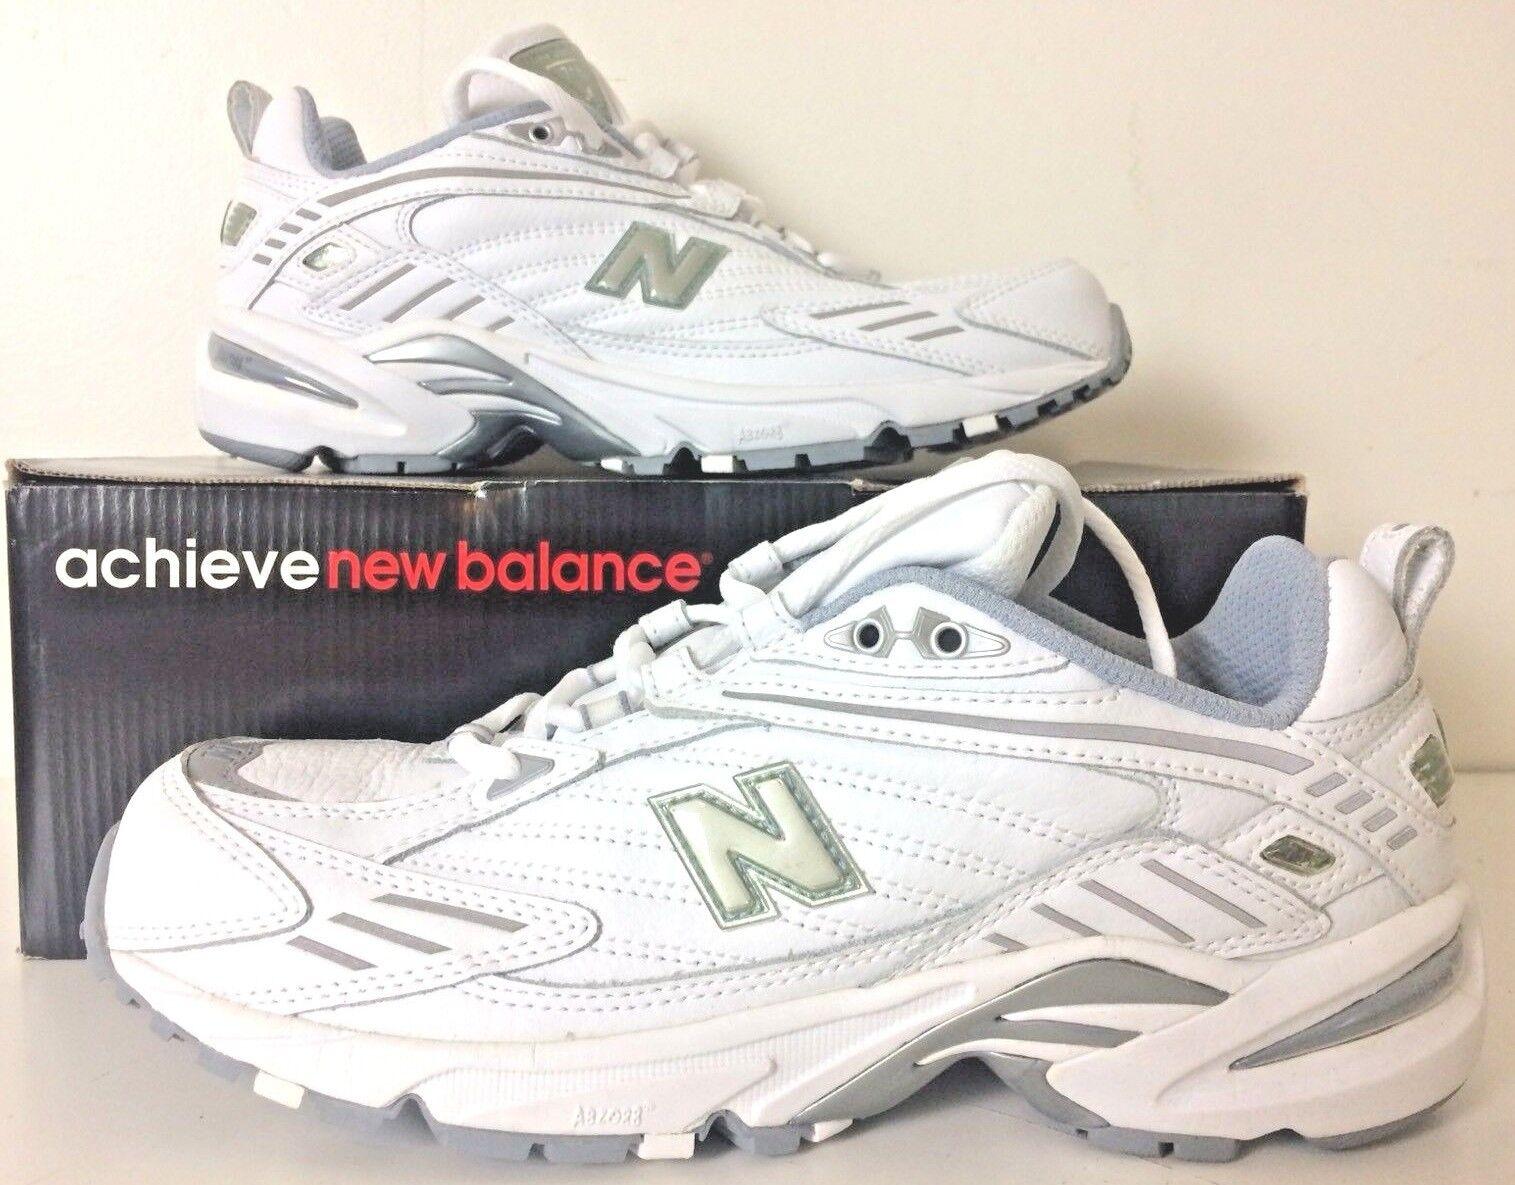 New Balance 716 Donna  scarpe da ginnastica ginnastica ginnastica U.S Dimensione 9 D New Deadstock 97caae